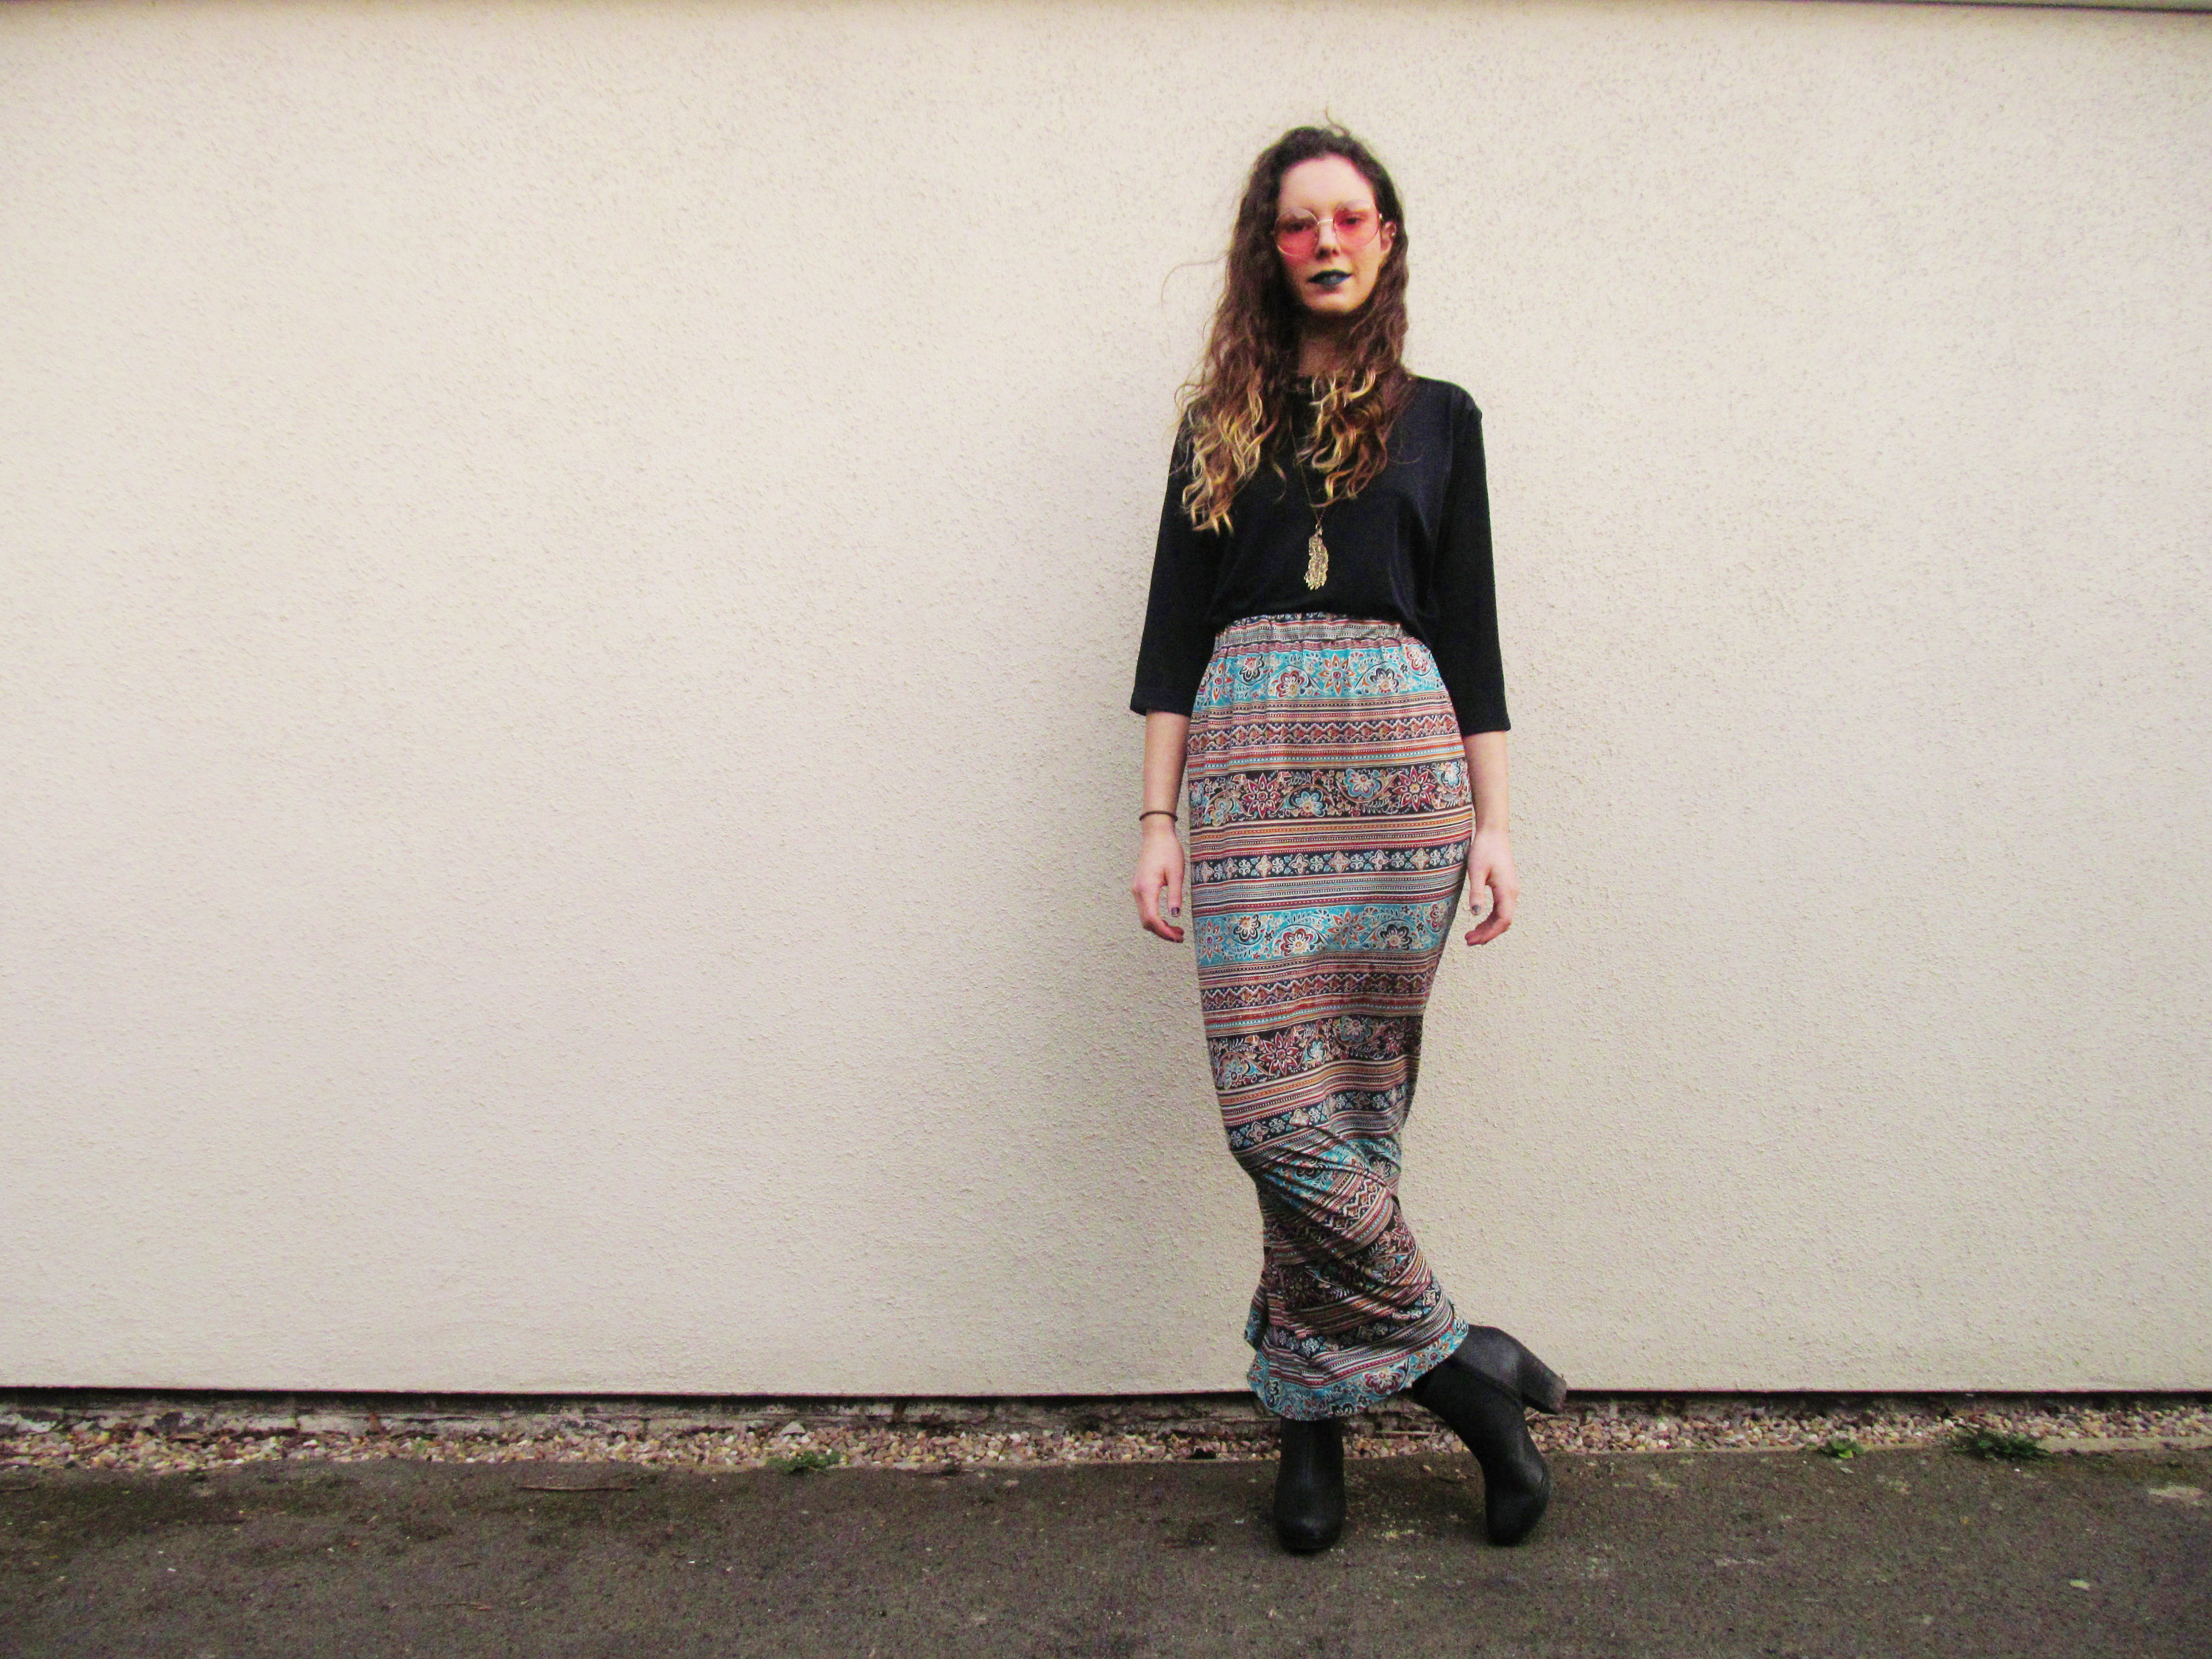 Jessthetics / How To Make A Maxi Skirt